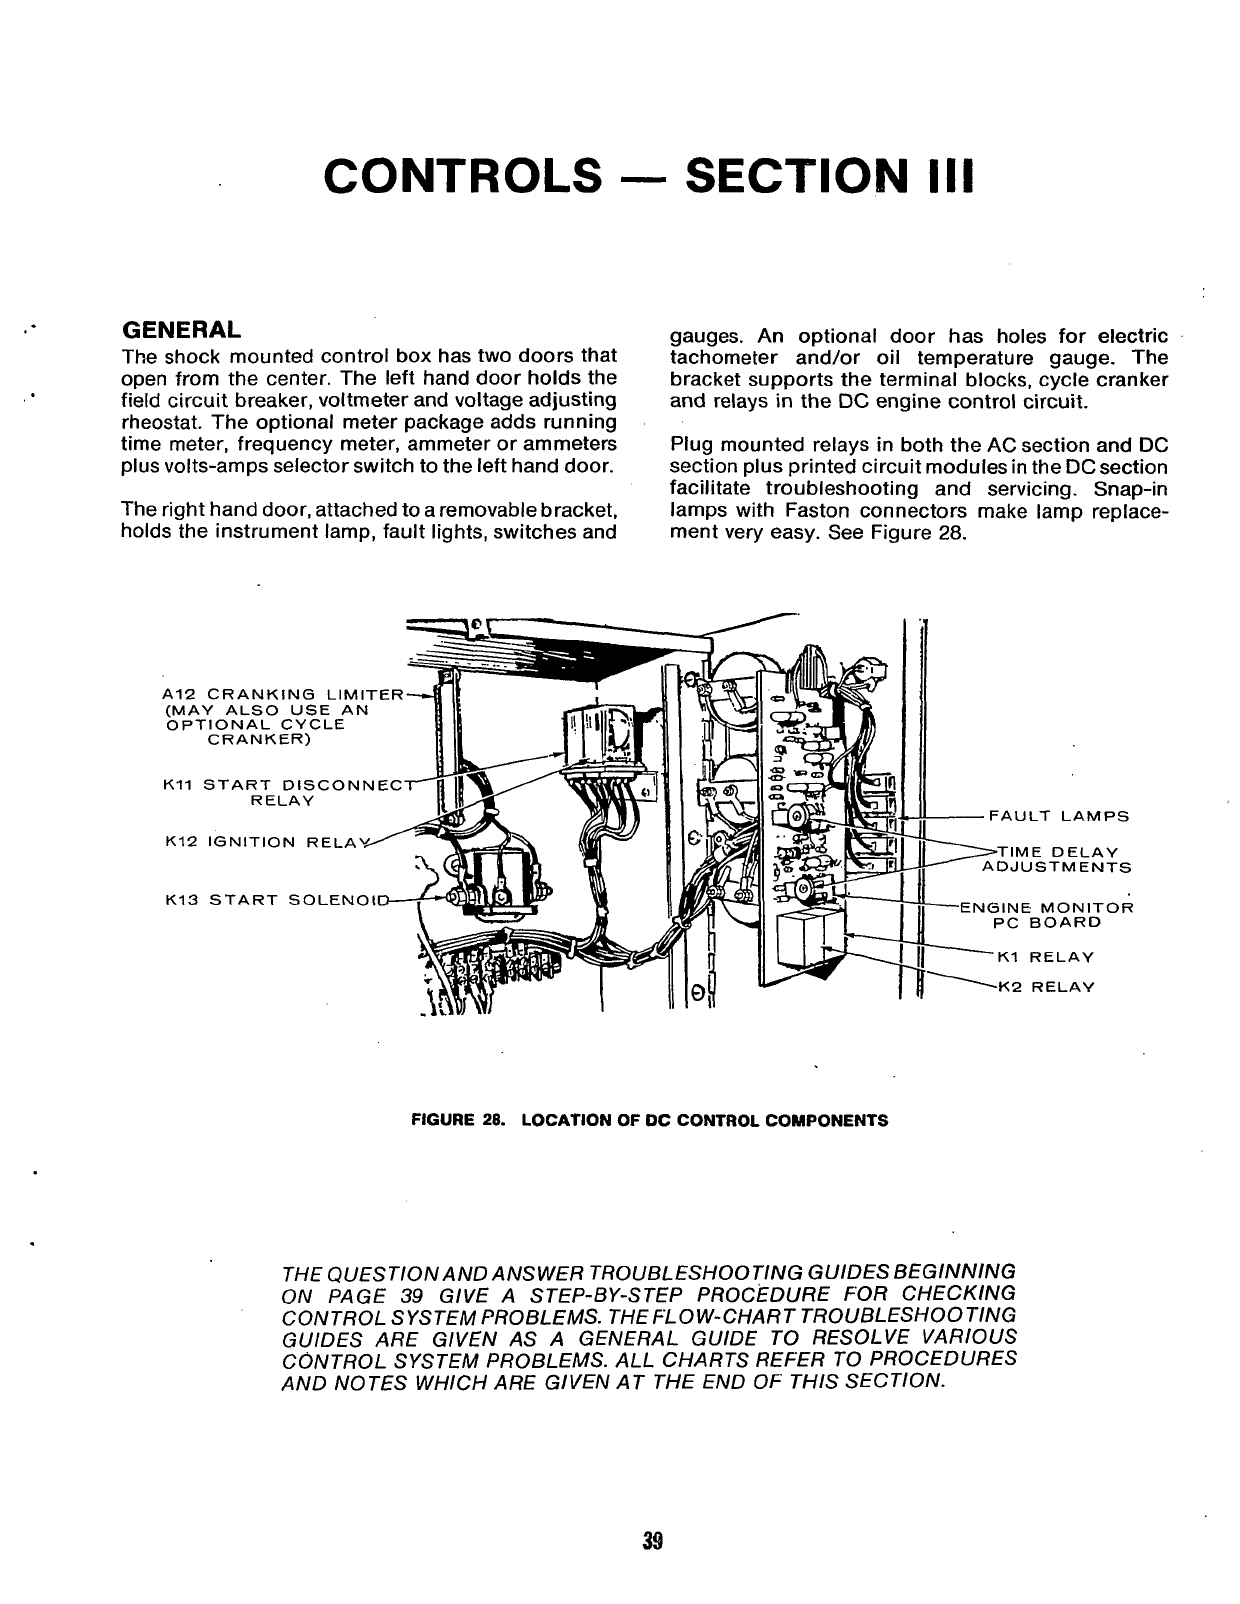 Onan Ur Generator Manual Pub 900 0150 Water Sensor Alarm Alarmcontrol Controlcircuit Circuit Diagram Controls